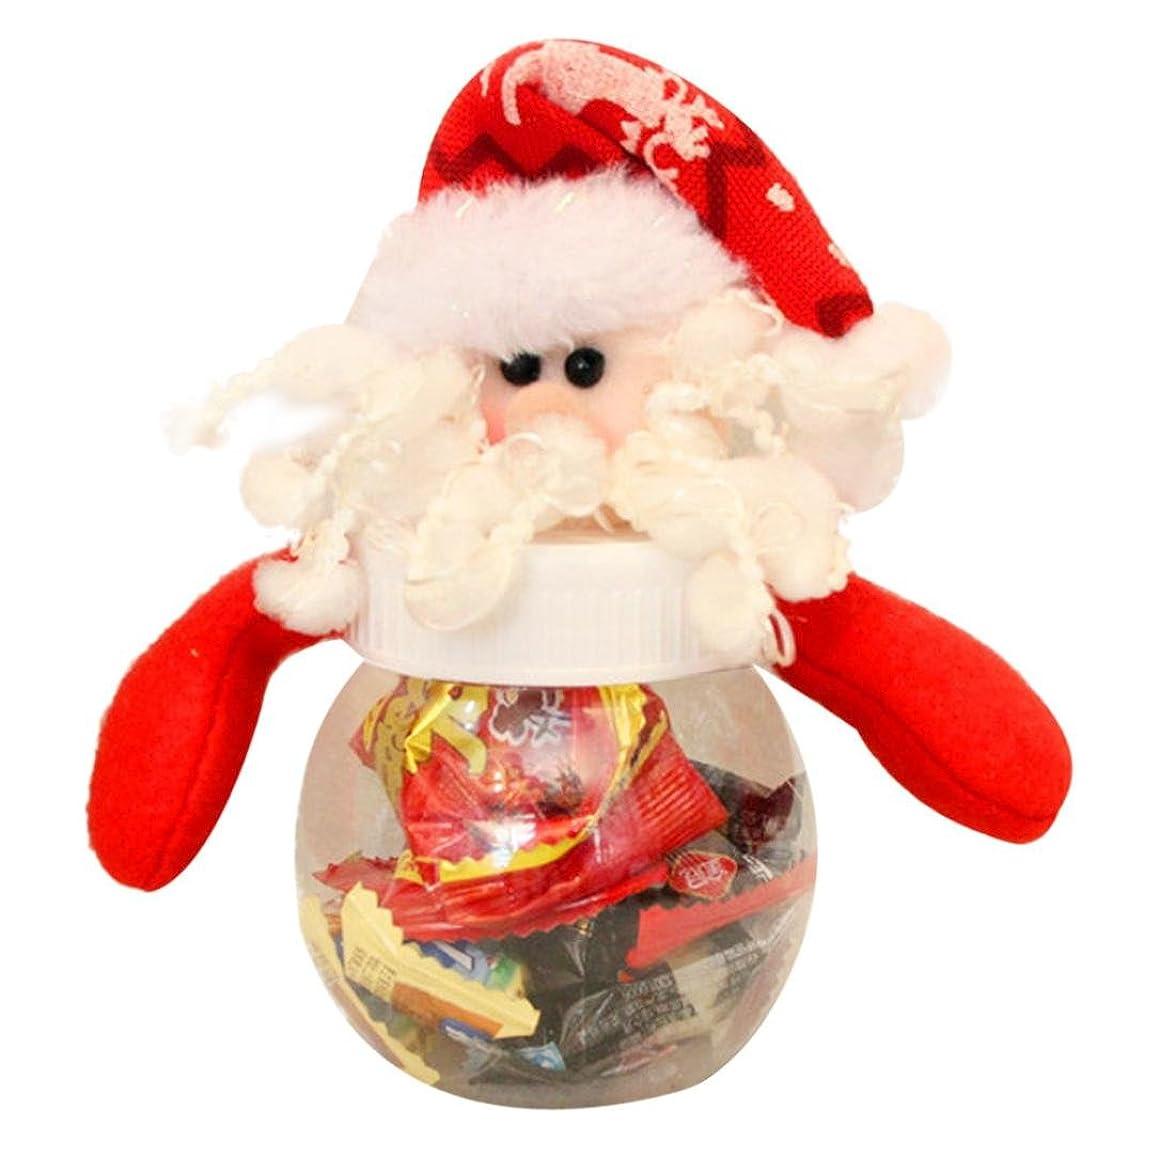 Quartly 1Pcs Christmas Decorative Candy Jar, Santa Claus Snowman Elk Candy Container Kids Xmas Gift Container, Christmas Decoration (C)